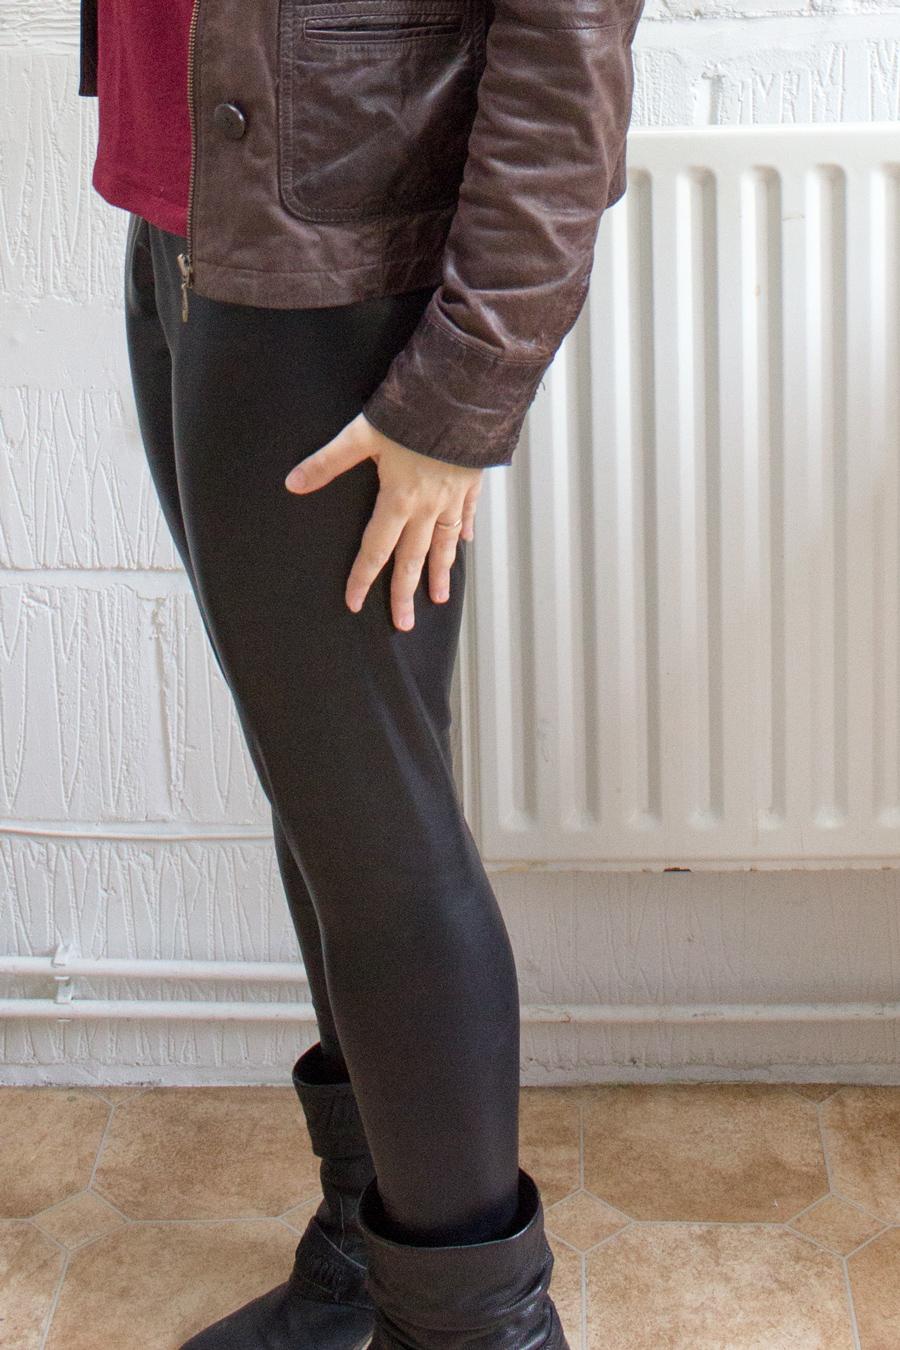 sew your own DIY leggings pattern